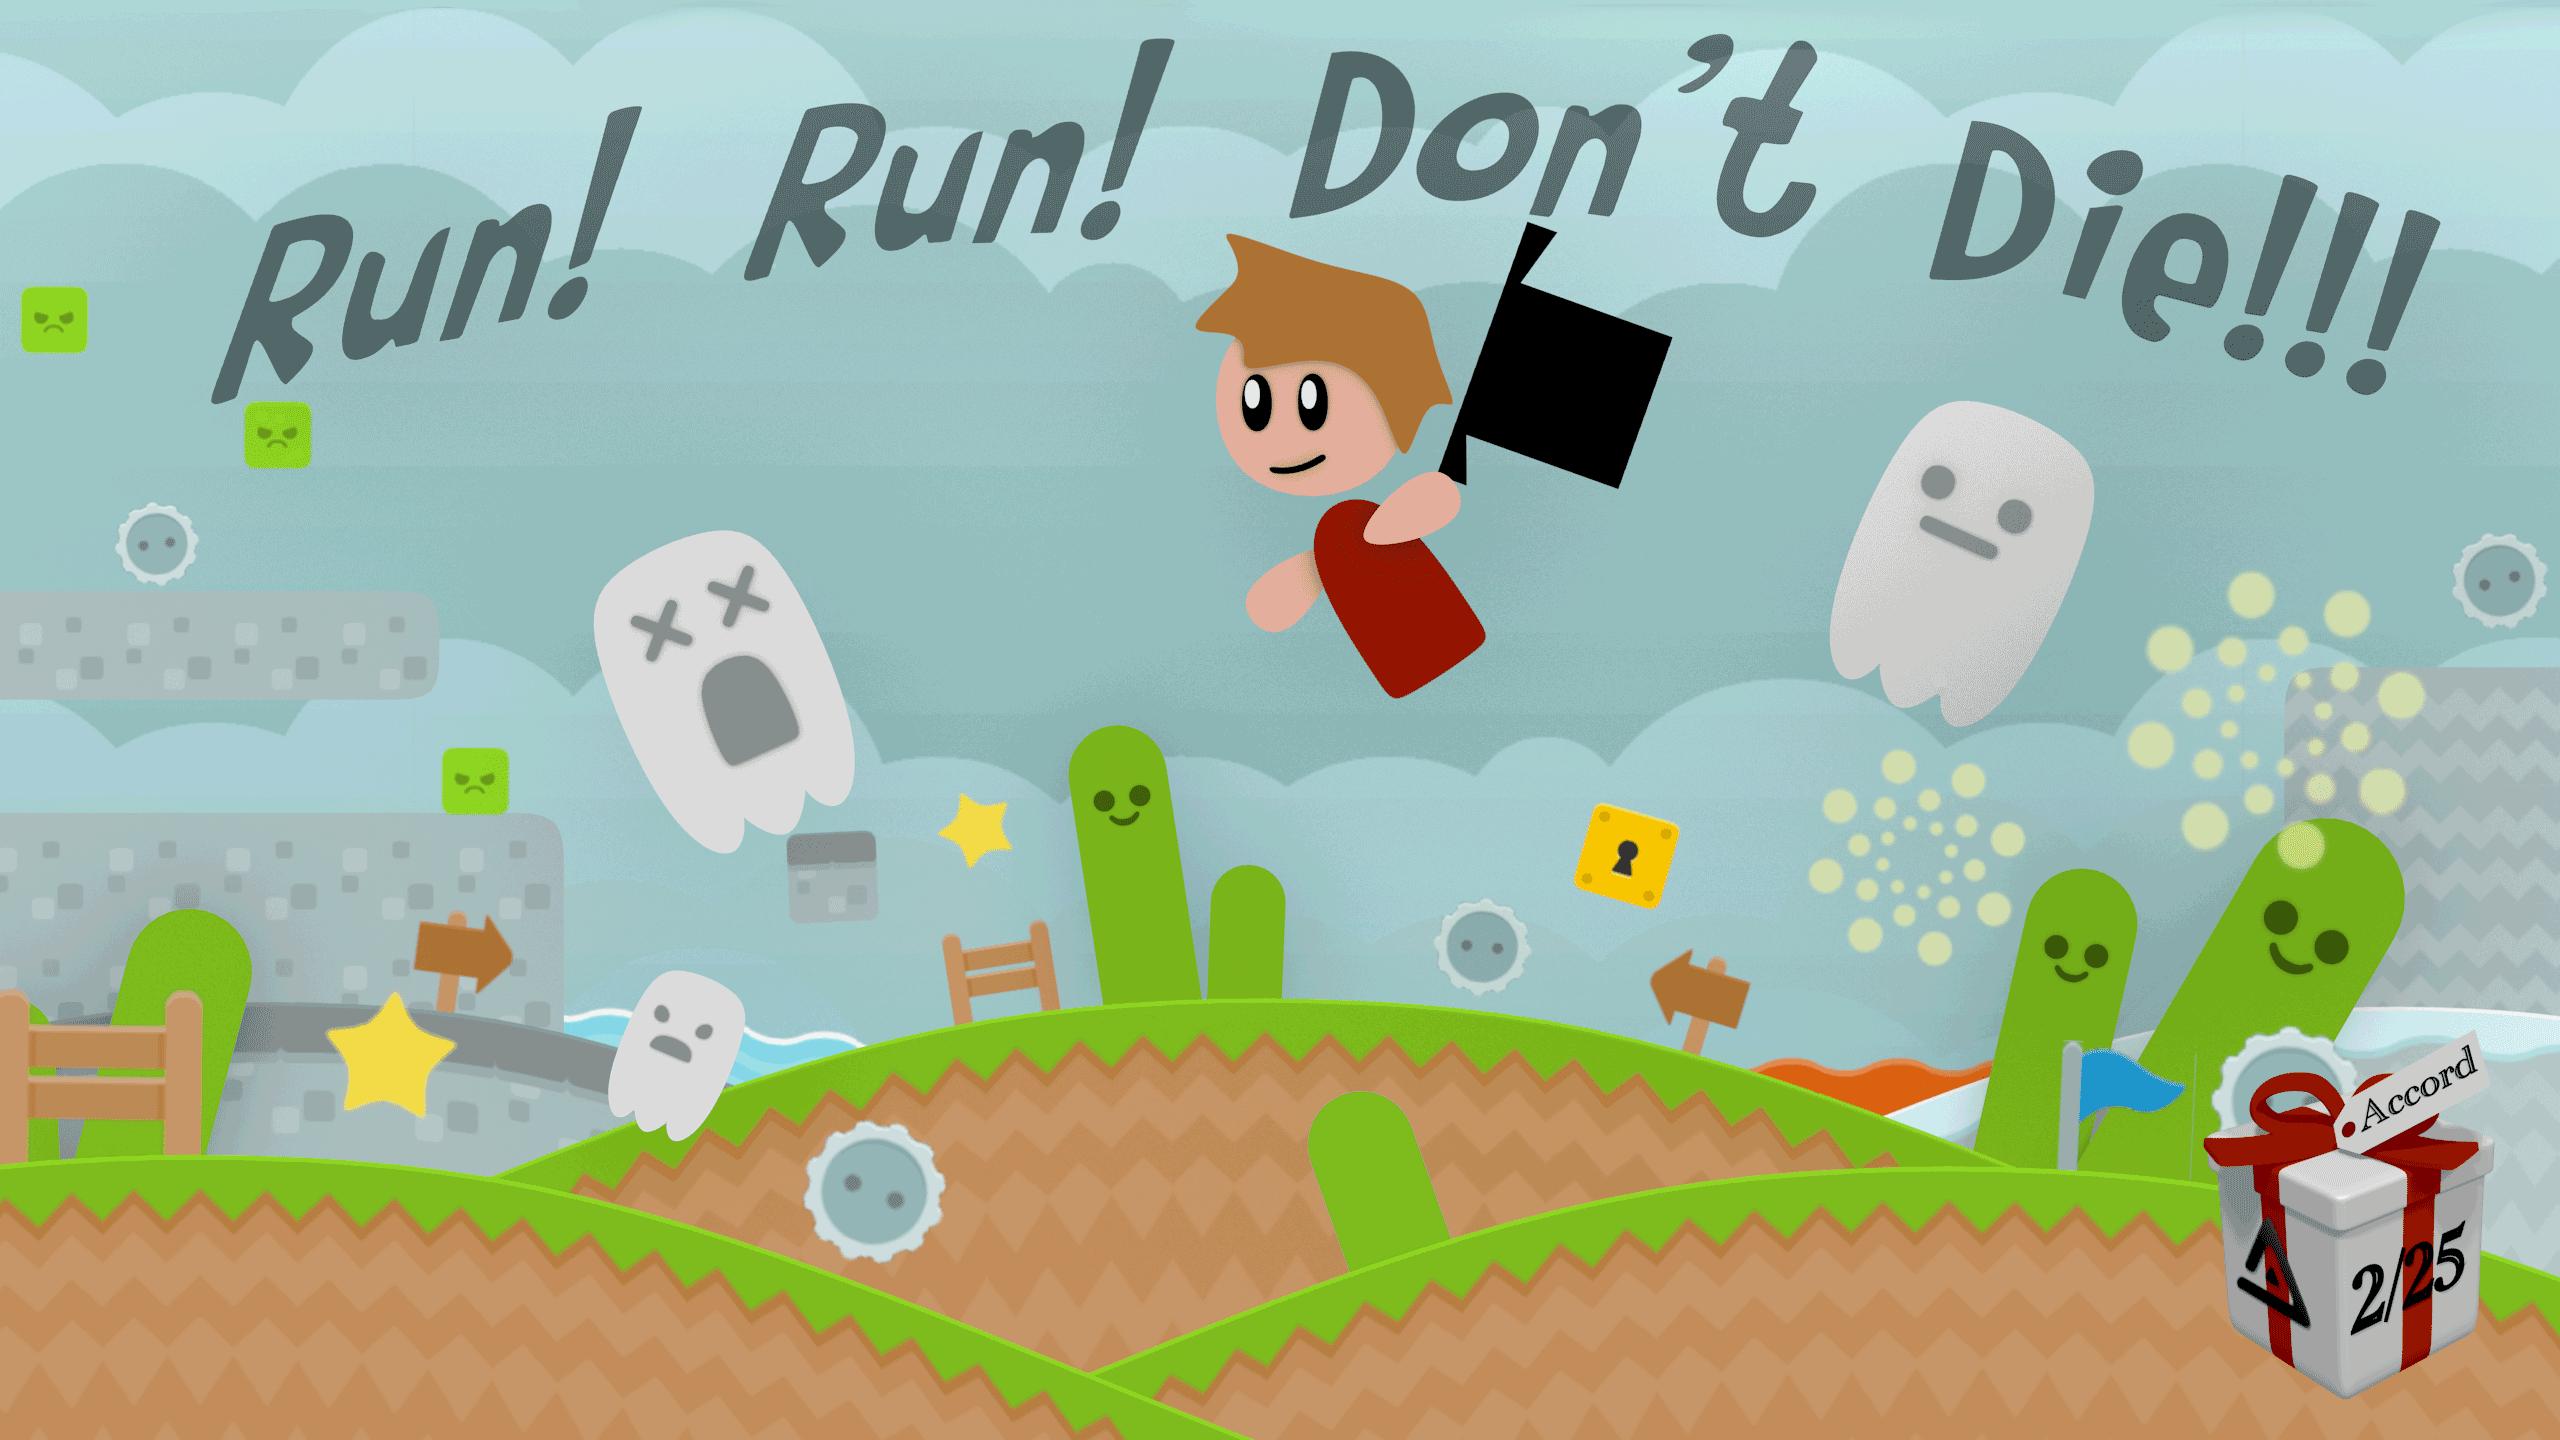 Run Run Don't Die Update